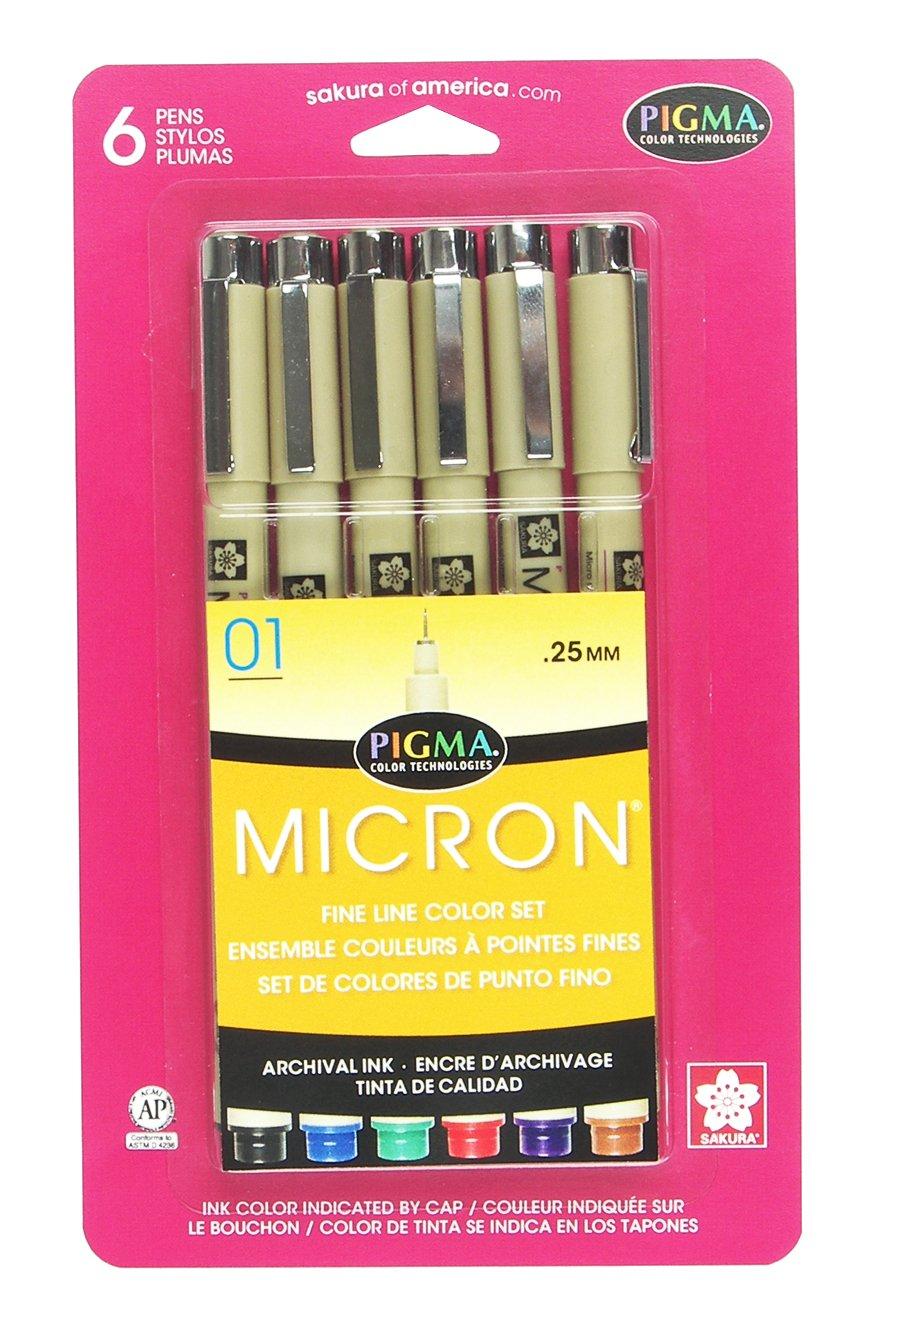 Sakura Pigma 30061 Micron Blister Card Ink Pen Set Ass/'t Point Size 3... Black